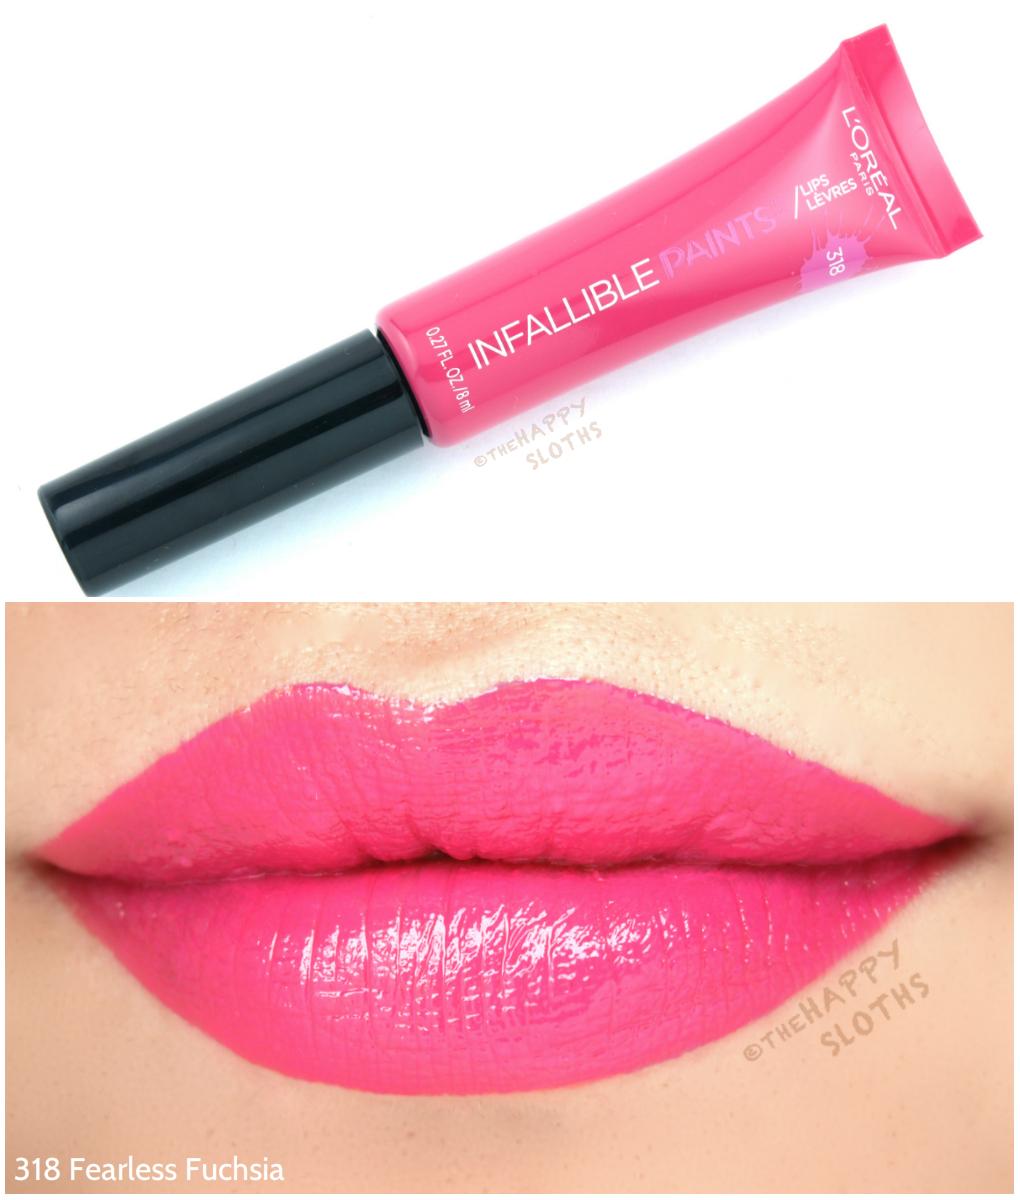 L'Oreal Infallible Lip Paints 318 Fearless Fuchsia